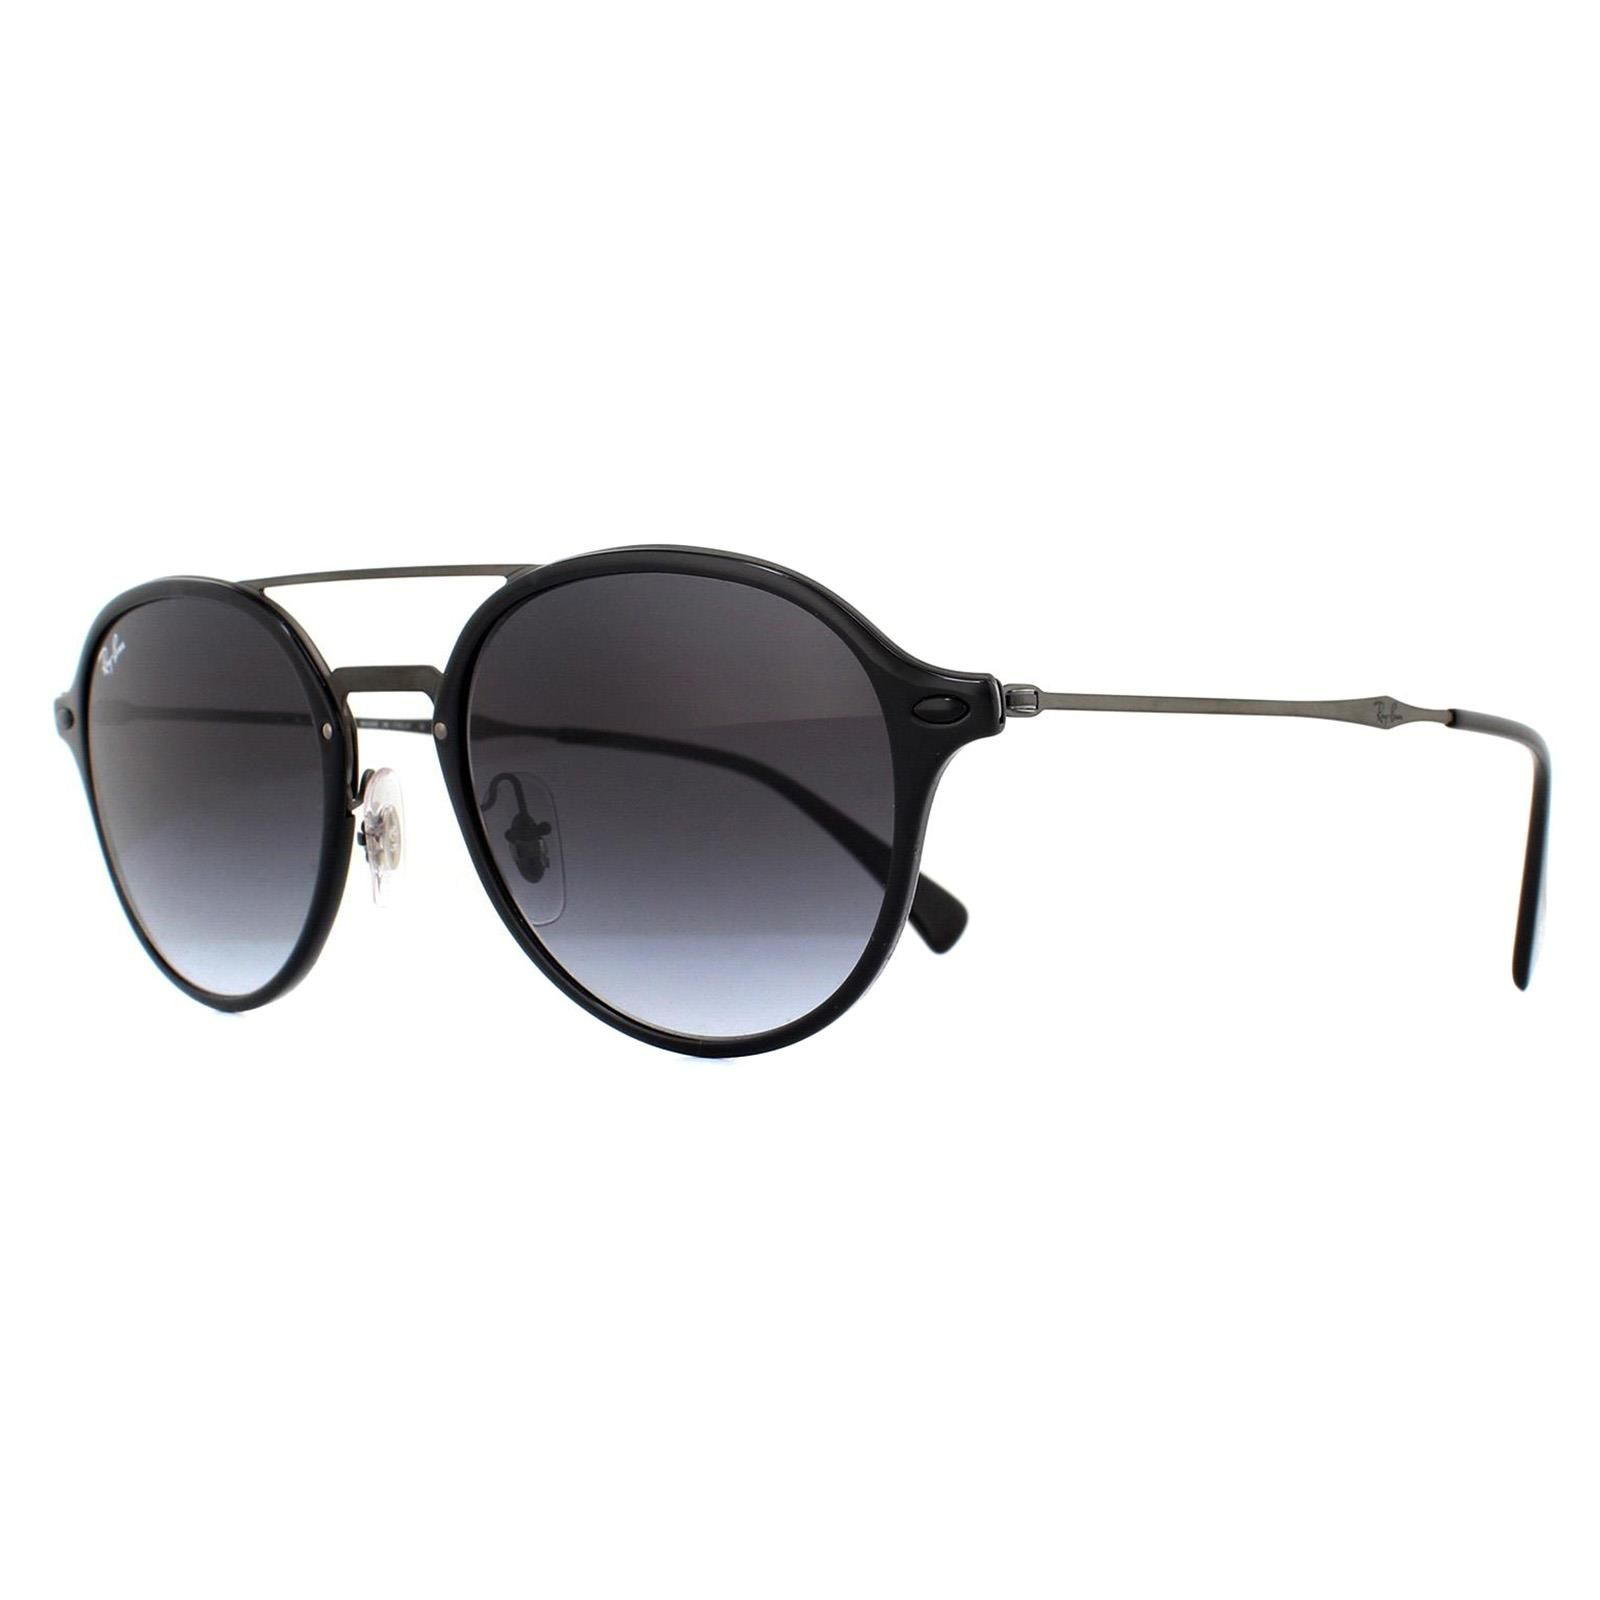 Ray-Ban Sunglasses 4287 601/8G Black Gunmetal Grey Gradient